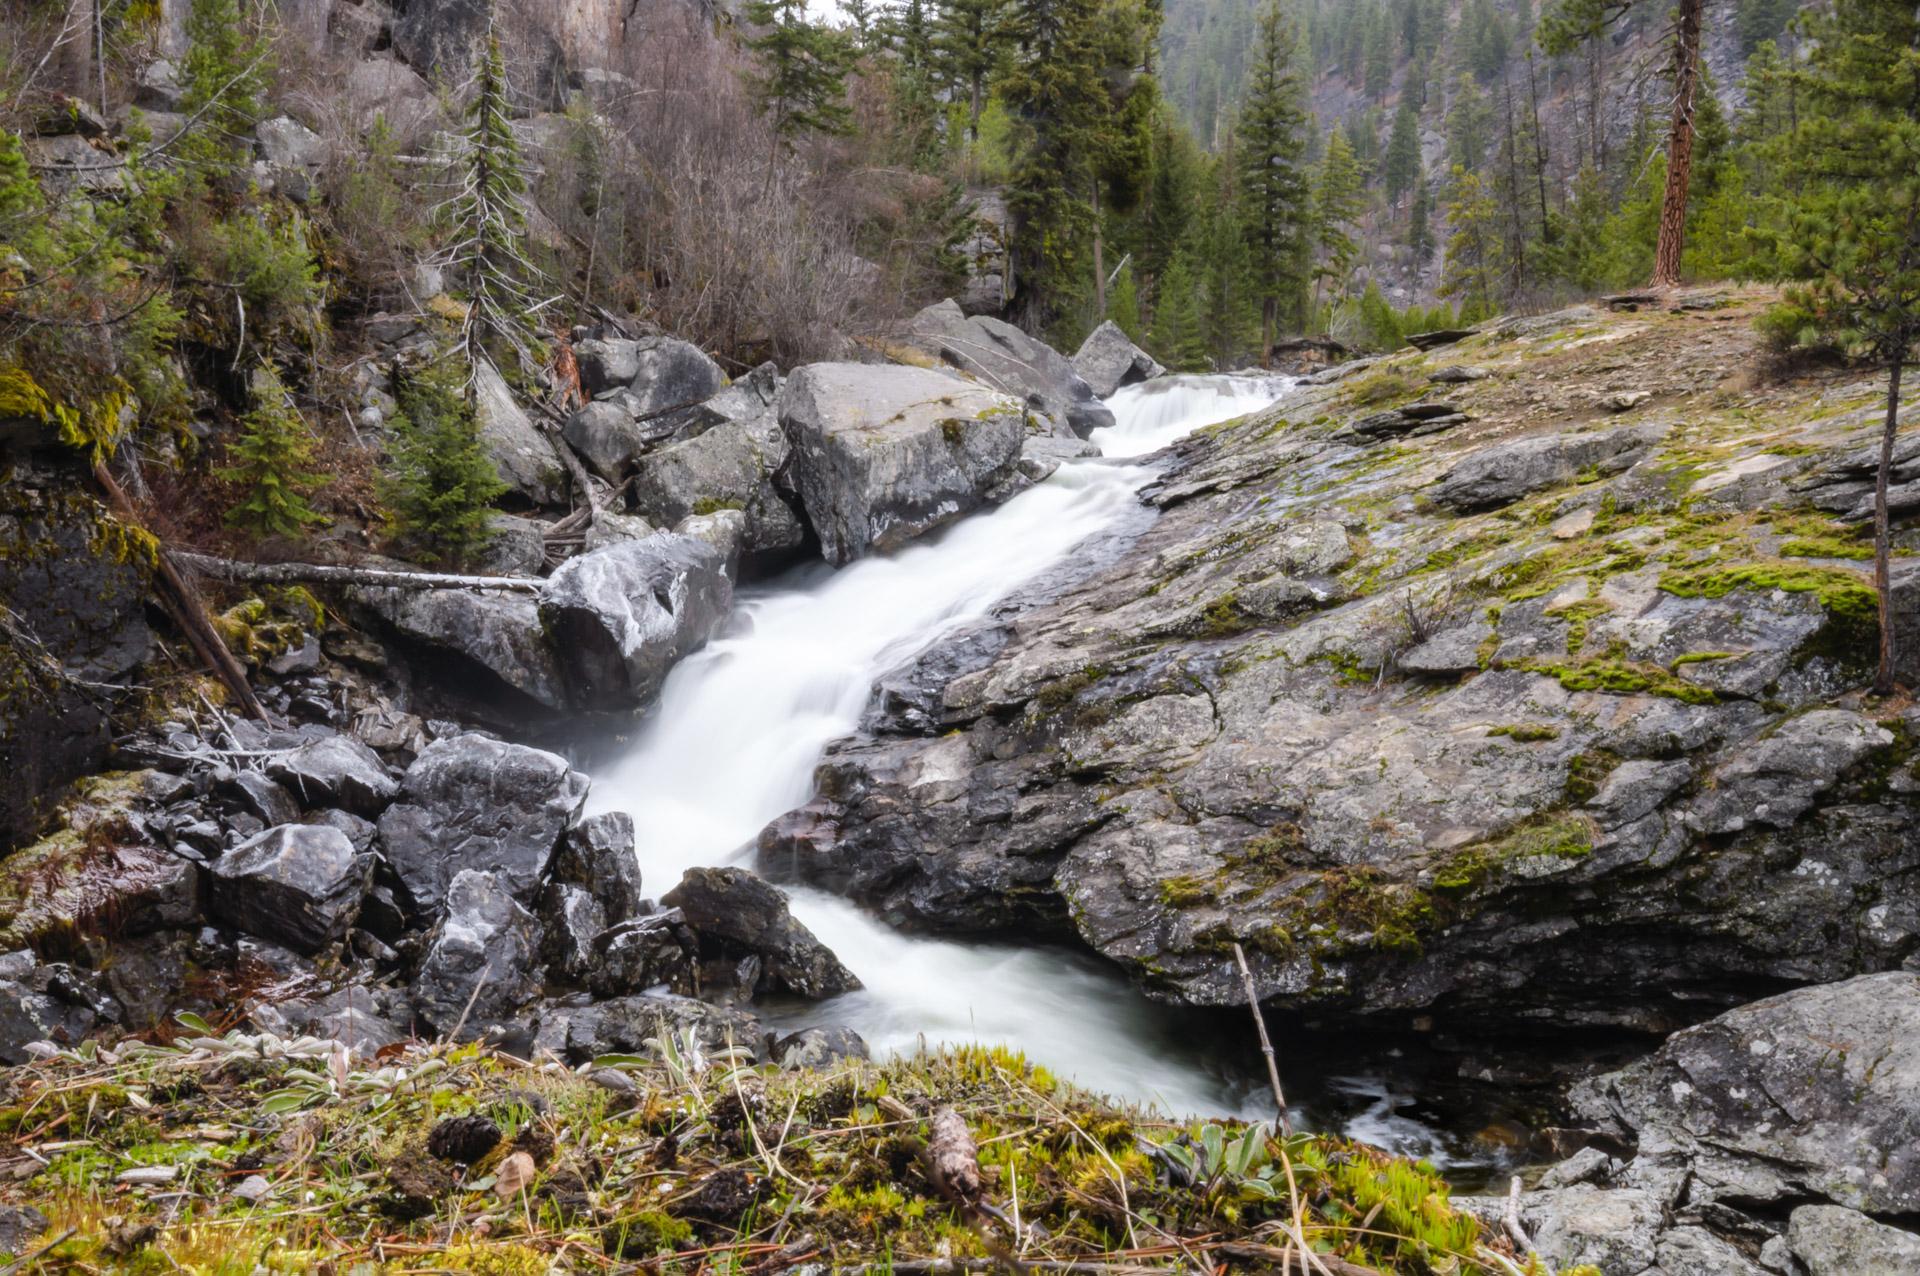 Waterfall on Rock Creek at the head of Lake Como